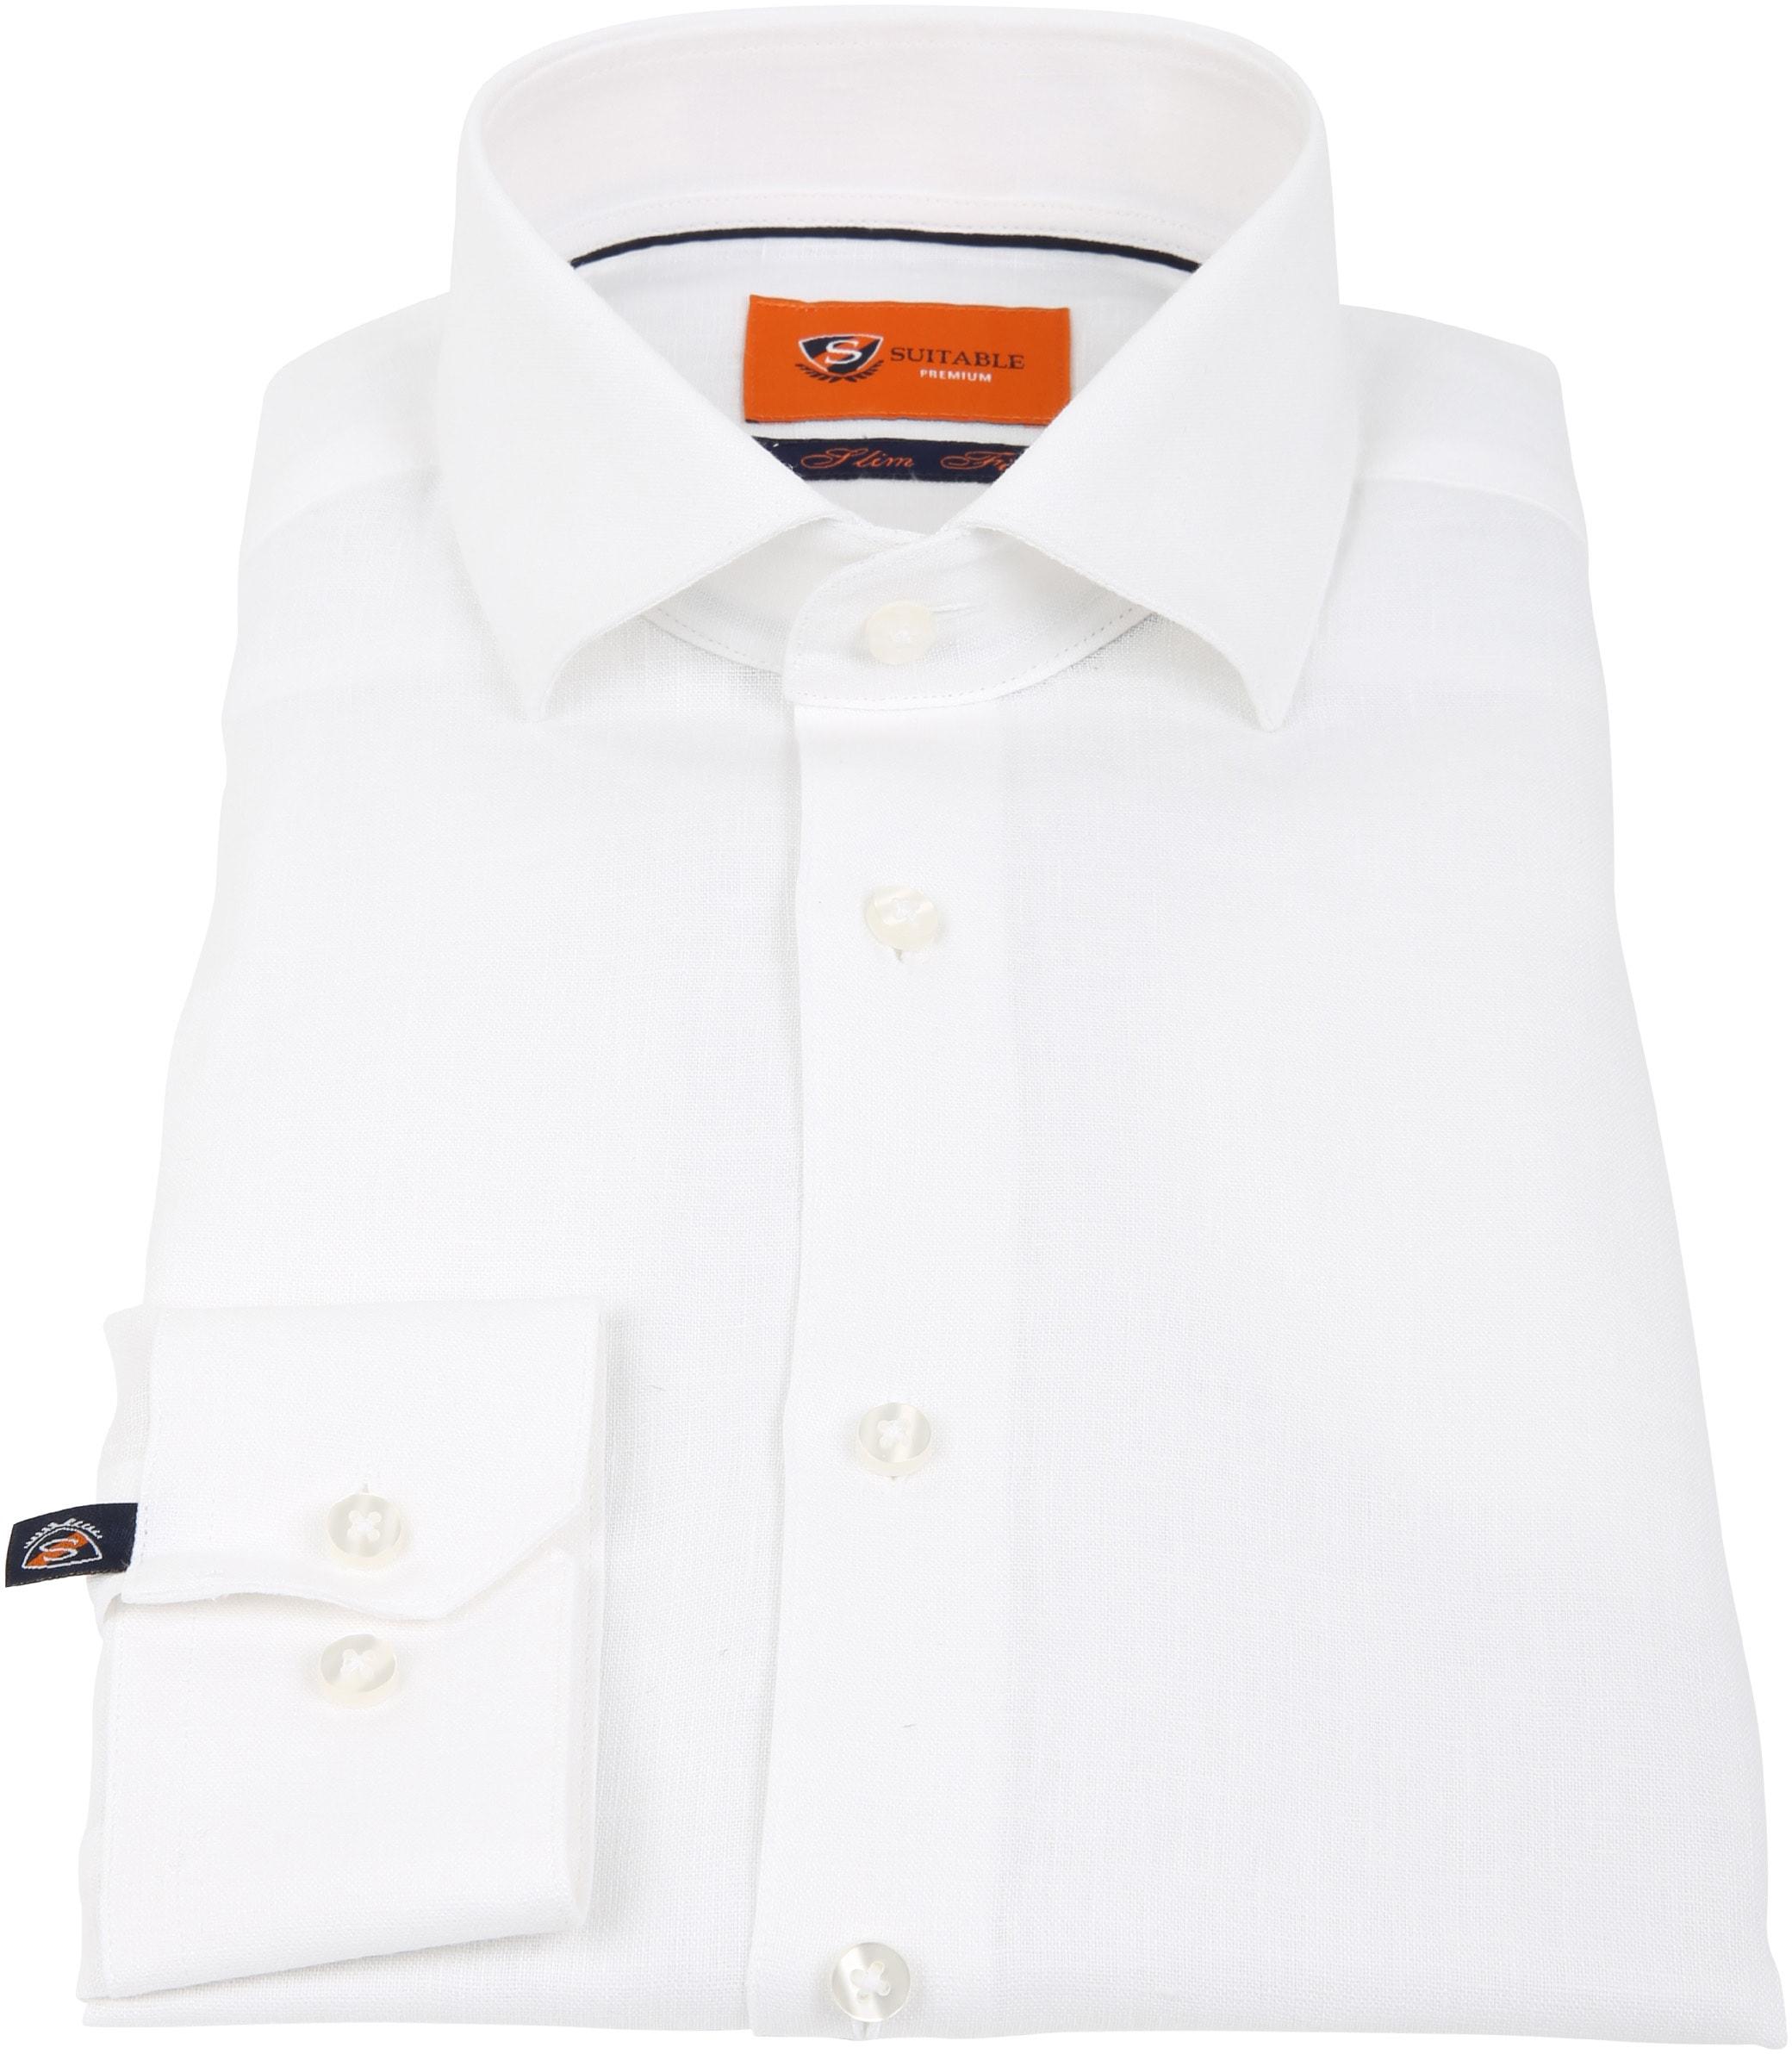 Suitable Overhemd Linnen Wit D81-13 foto 2